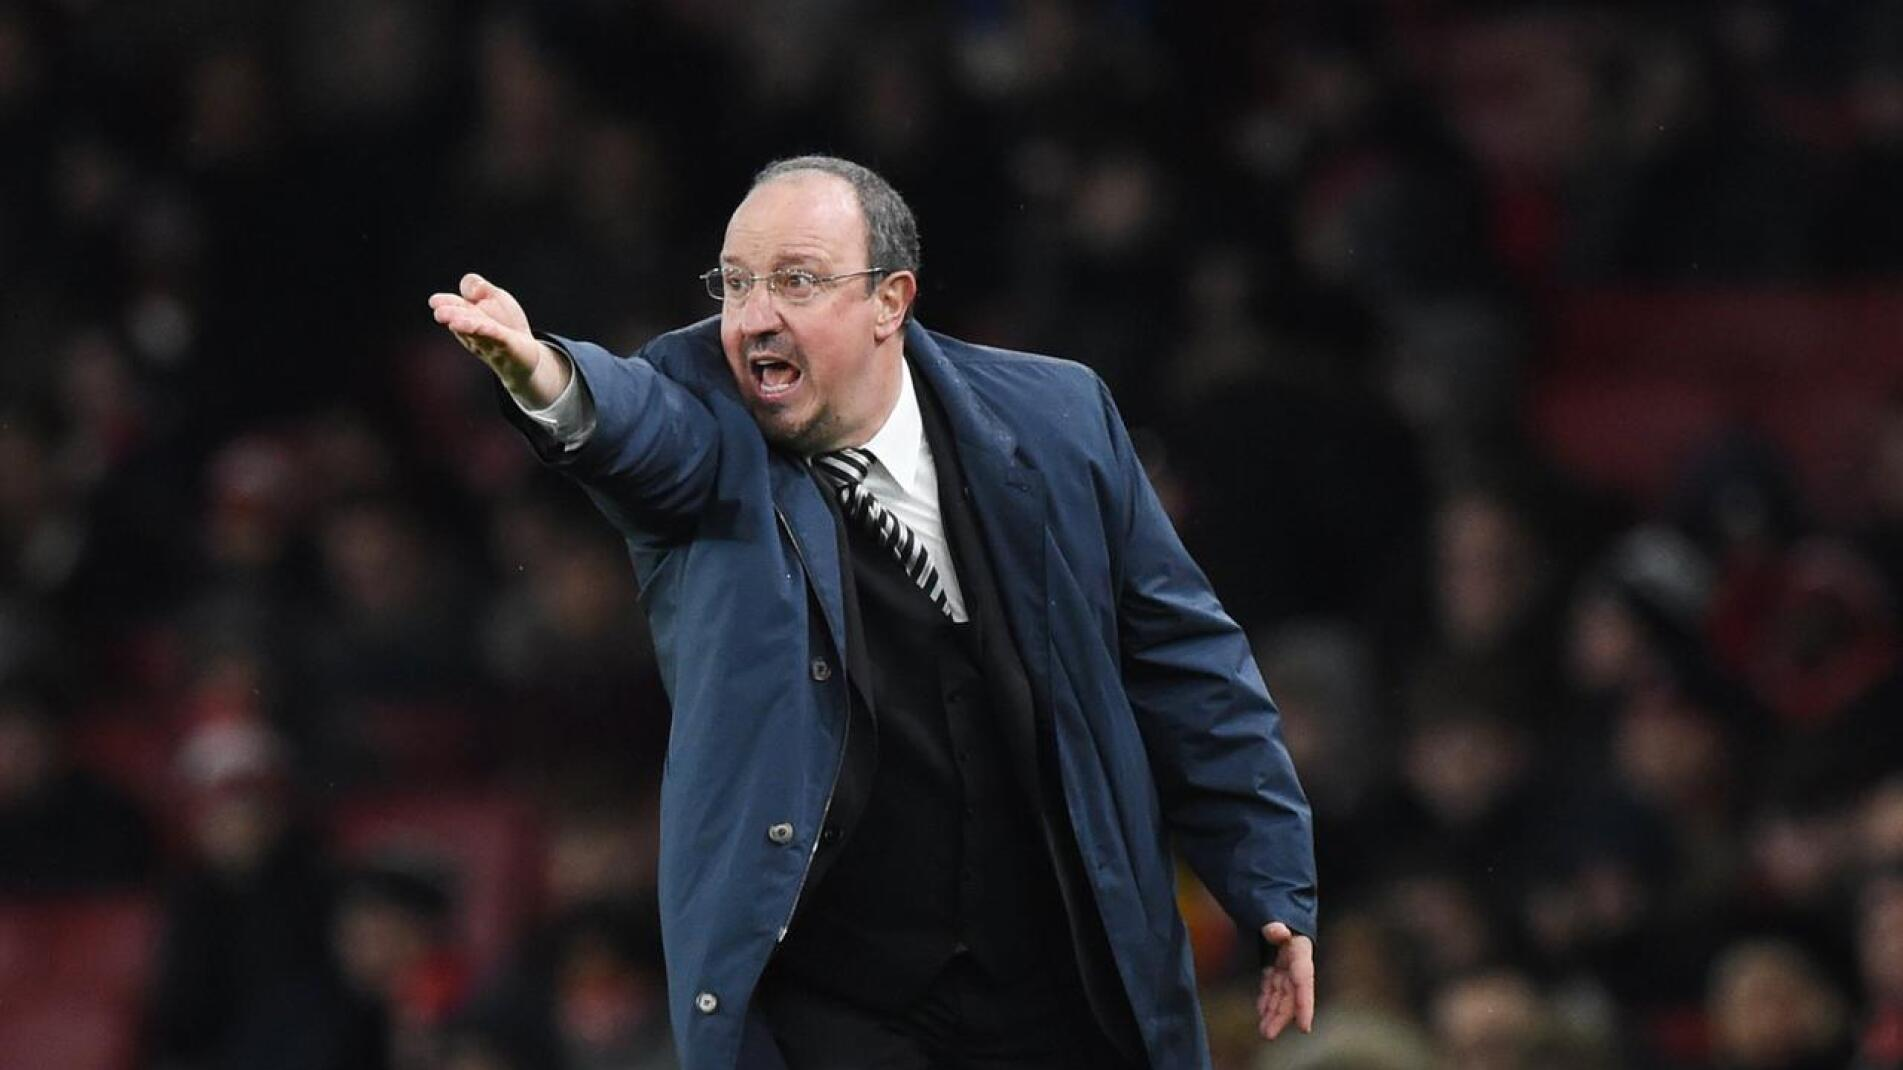 New Everton manager Rafa Benitez